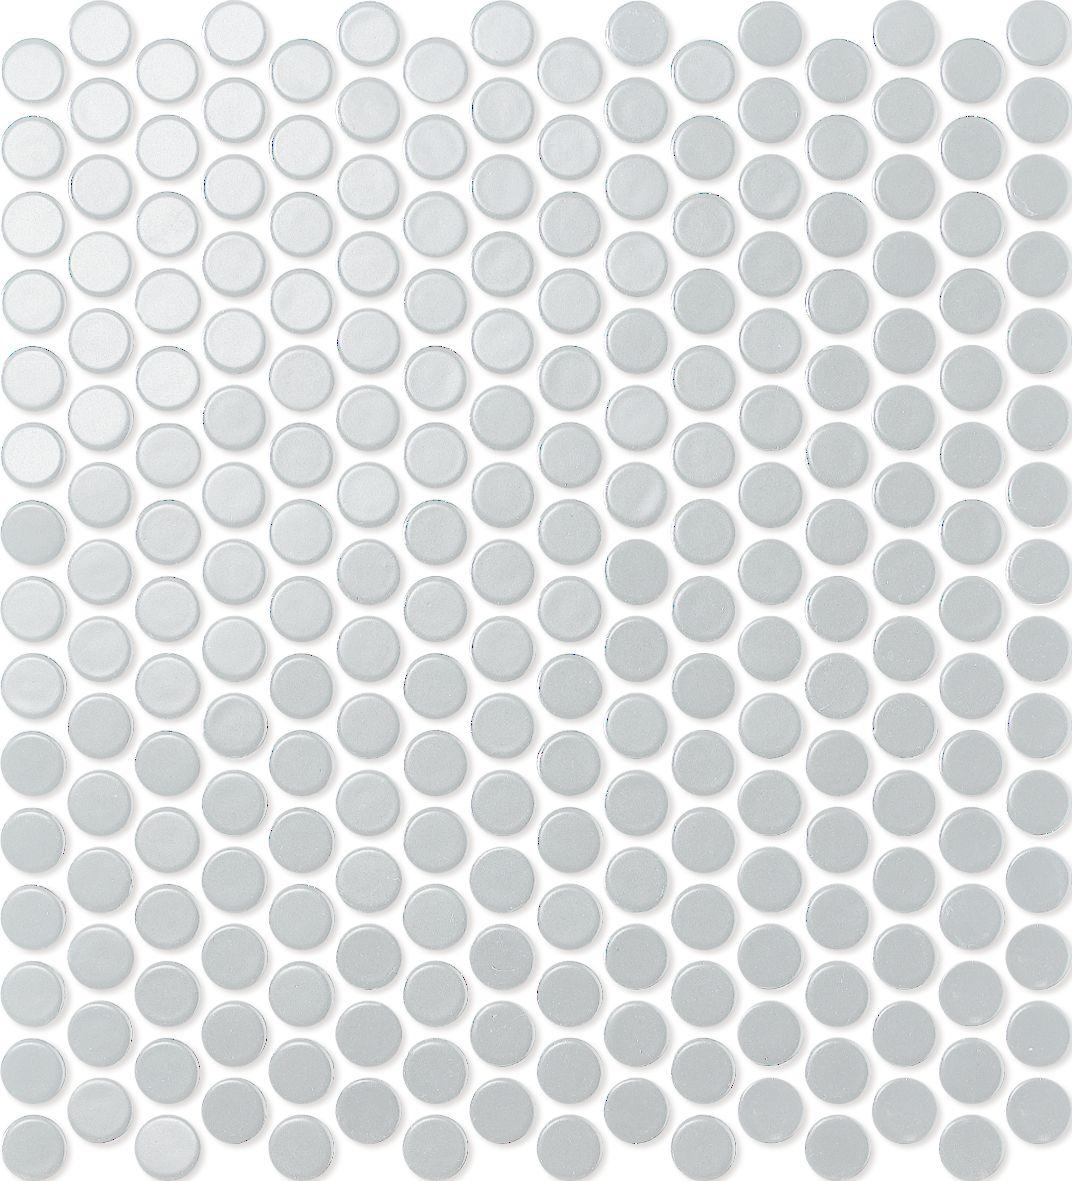 PENNY ROUND WHITE MATT HL0101 R10 19mm - Hansas Plaadimaailm